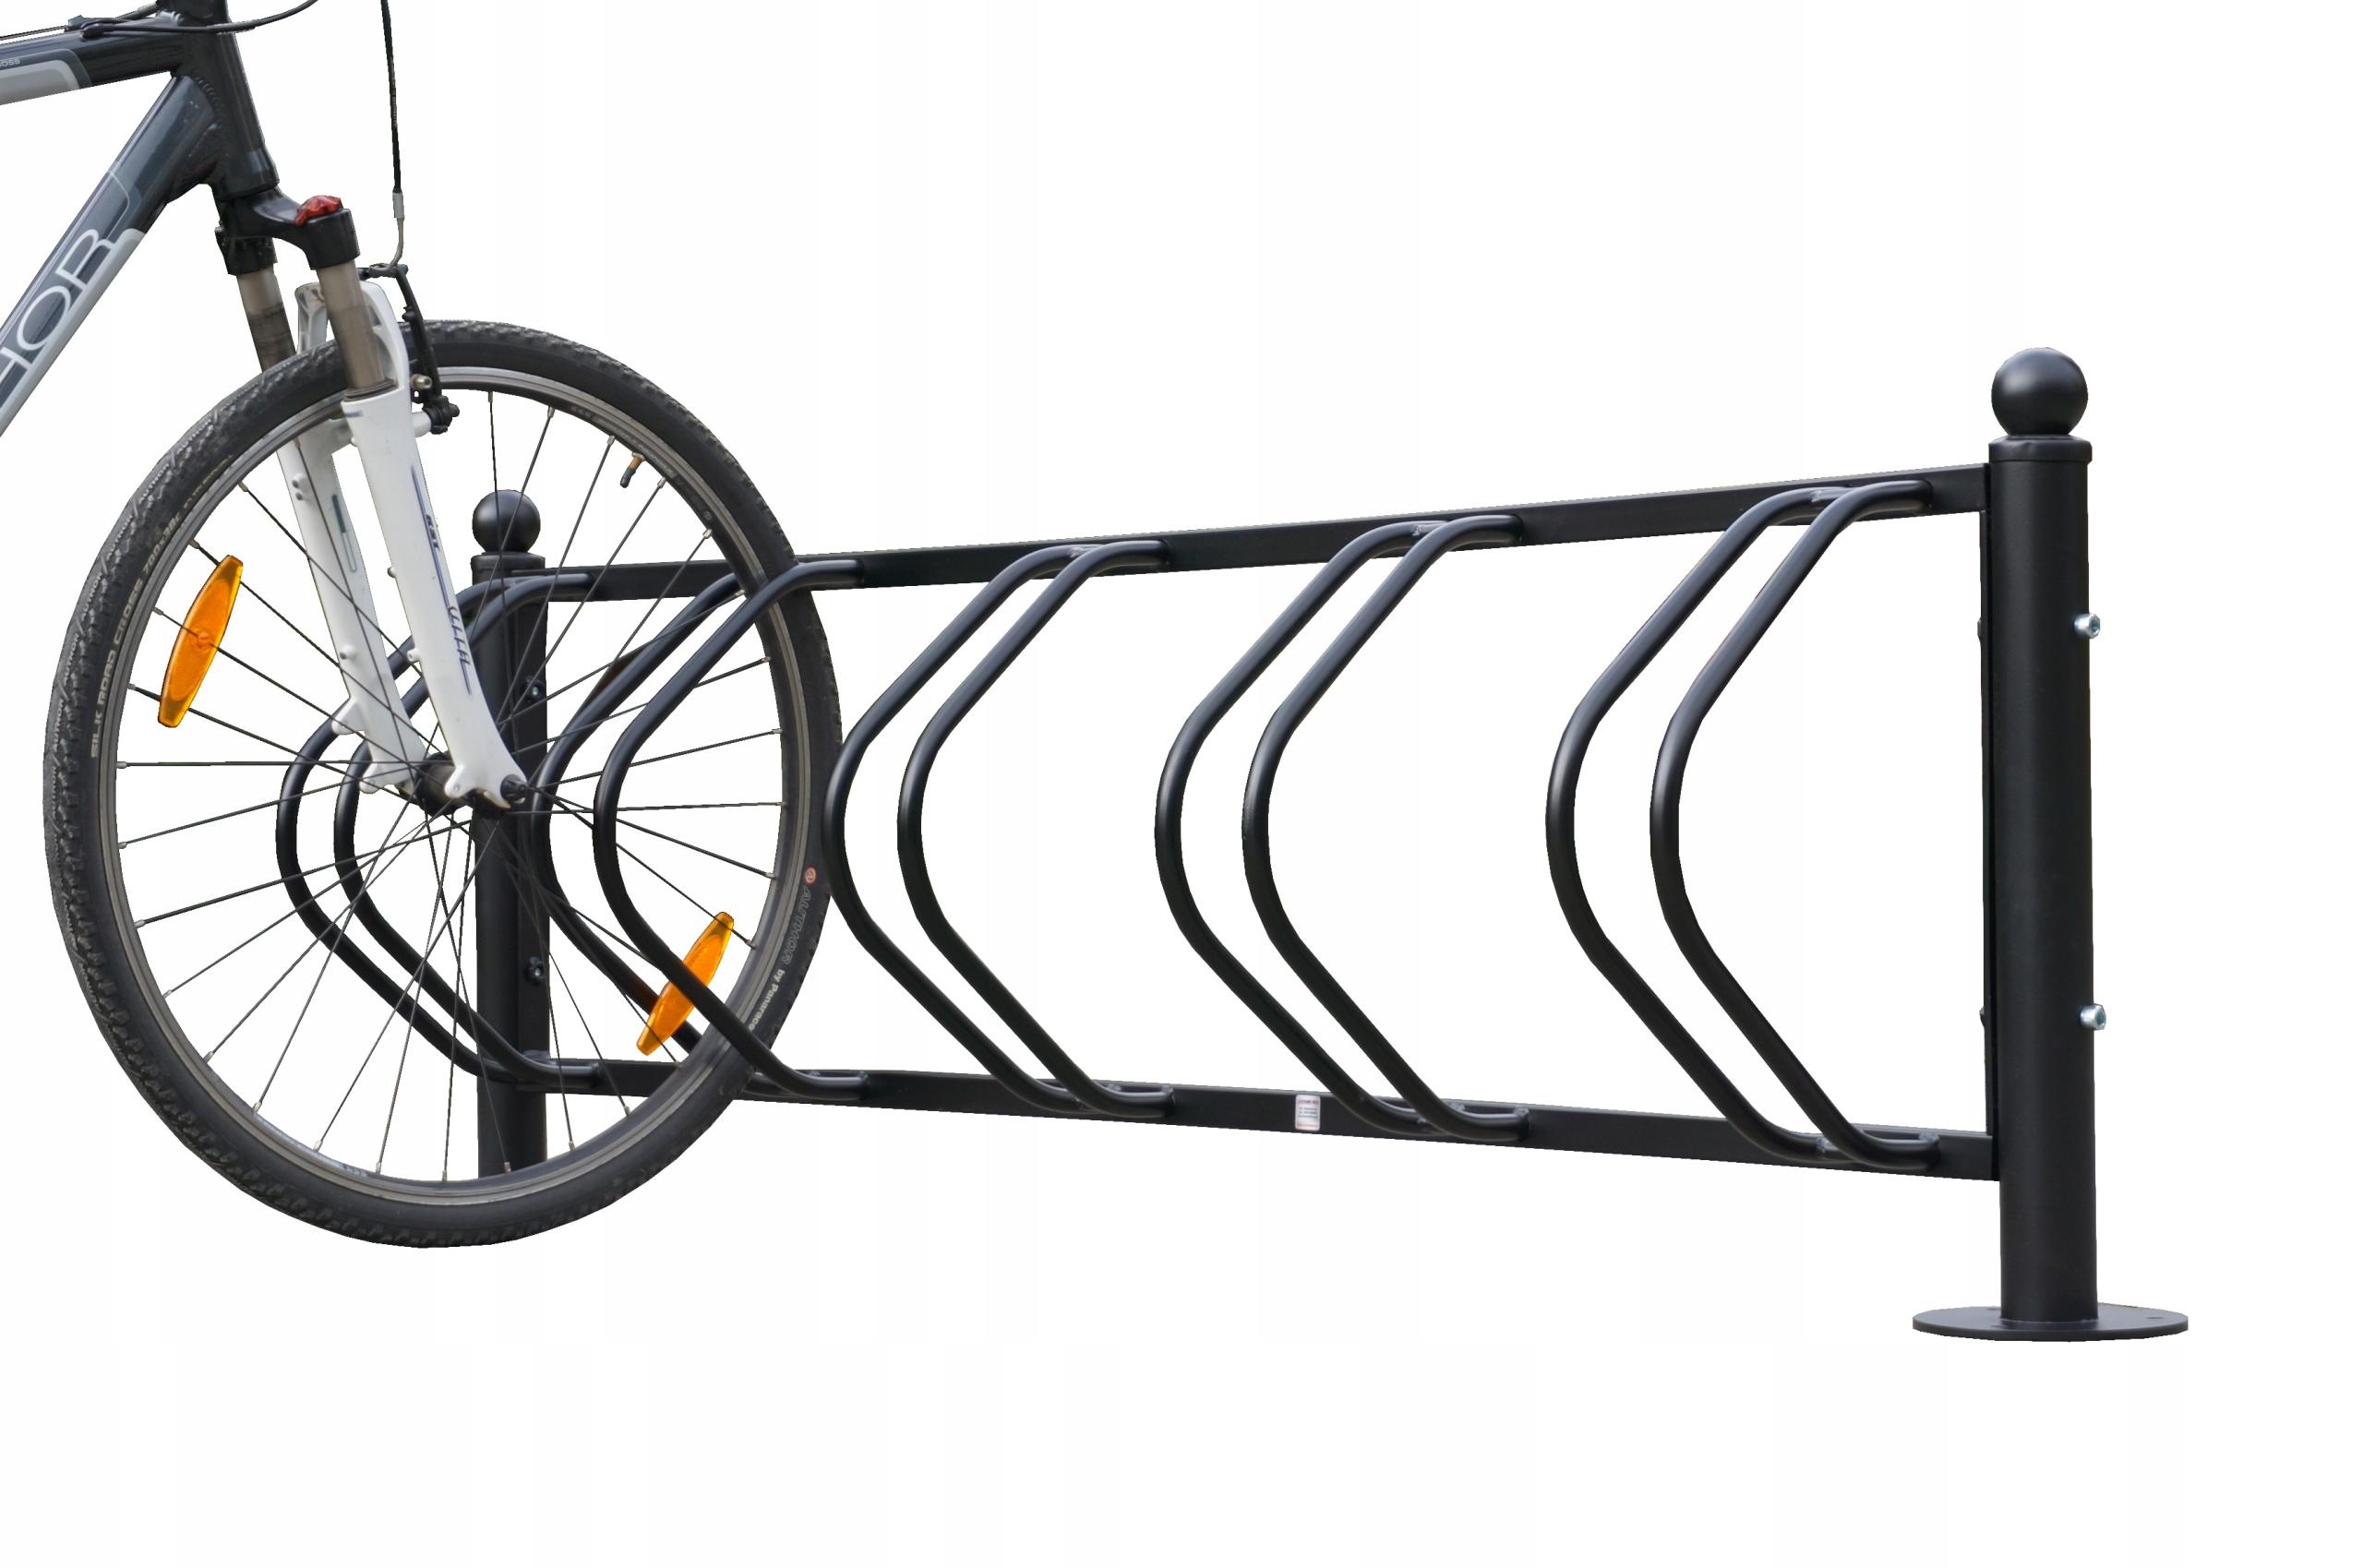 REGÁL PRE BICYKLE 5 RETRO bicyklov